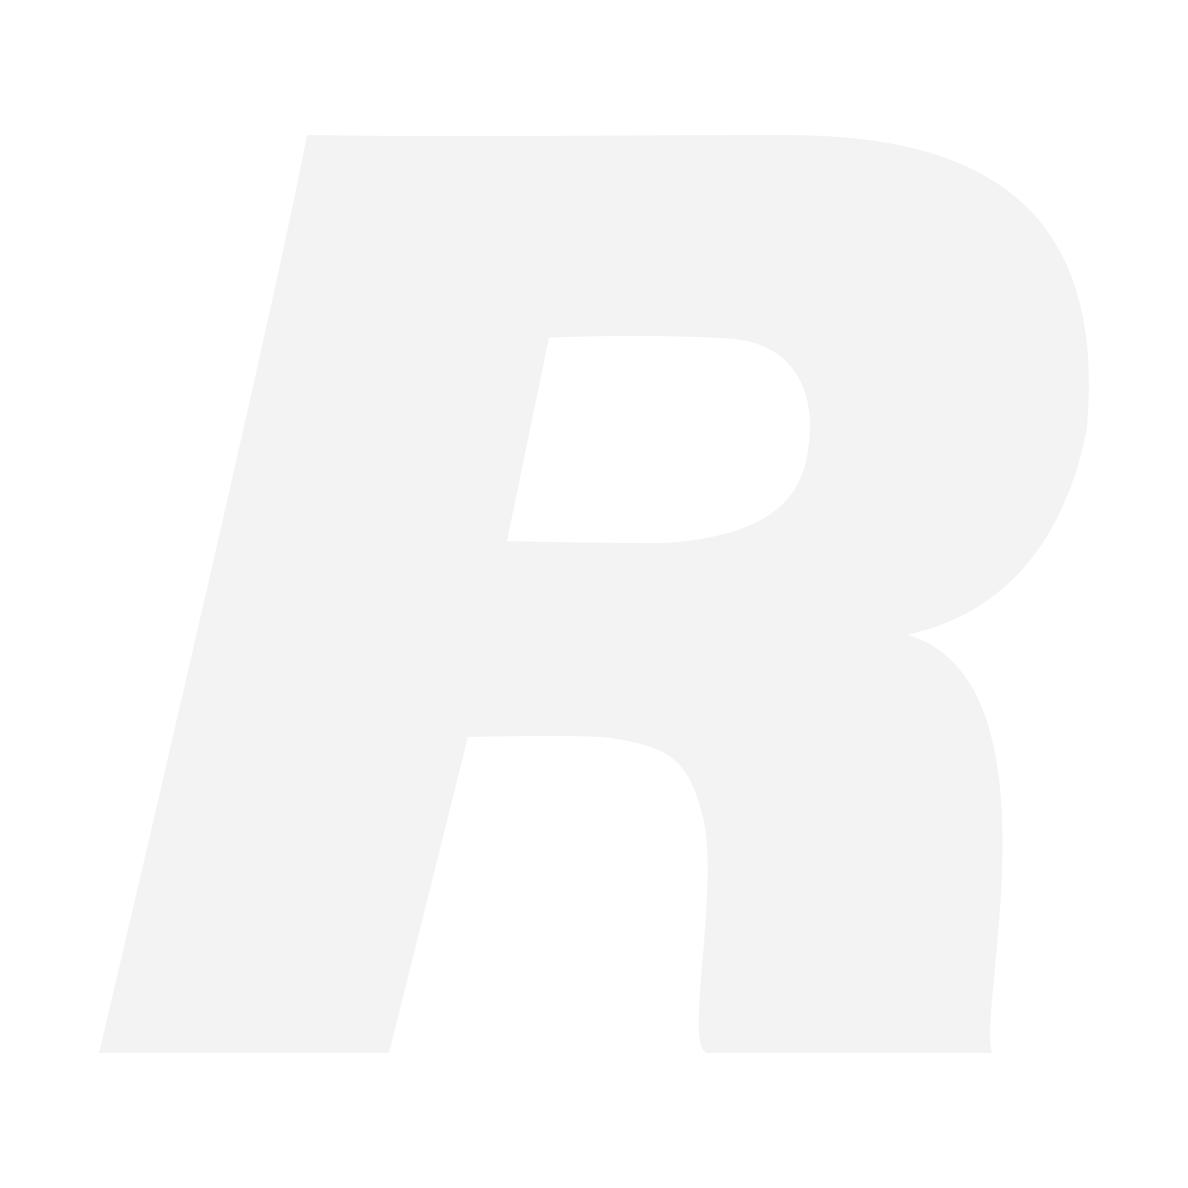 Olloclip Selfie 3-in-1 Lens, hopea/musta (iPhone 5/5s)